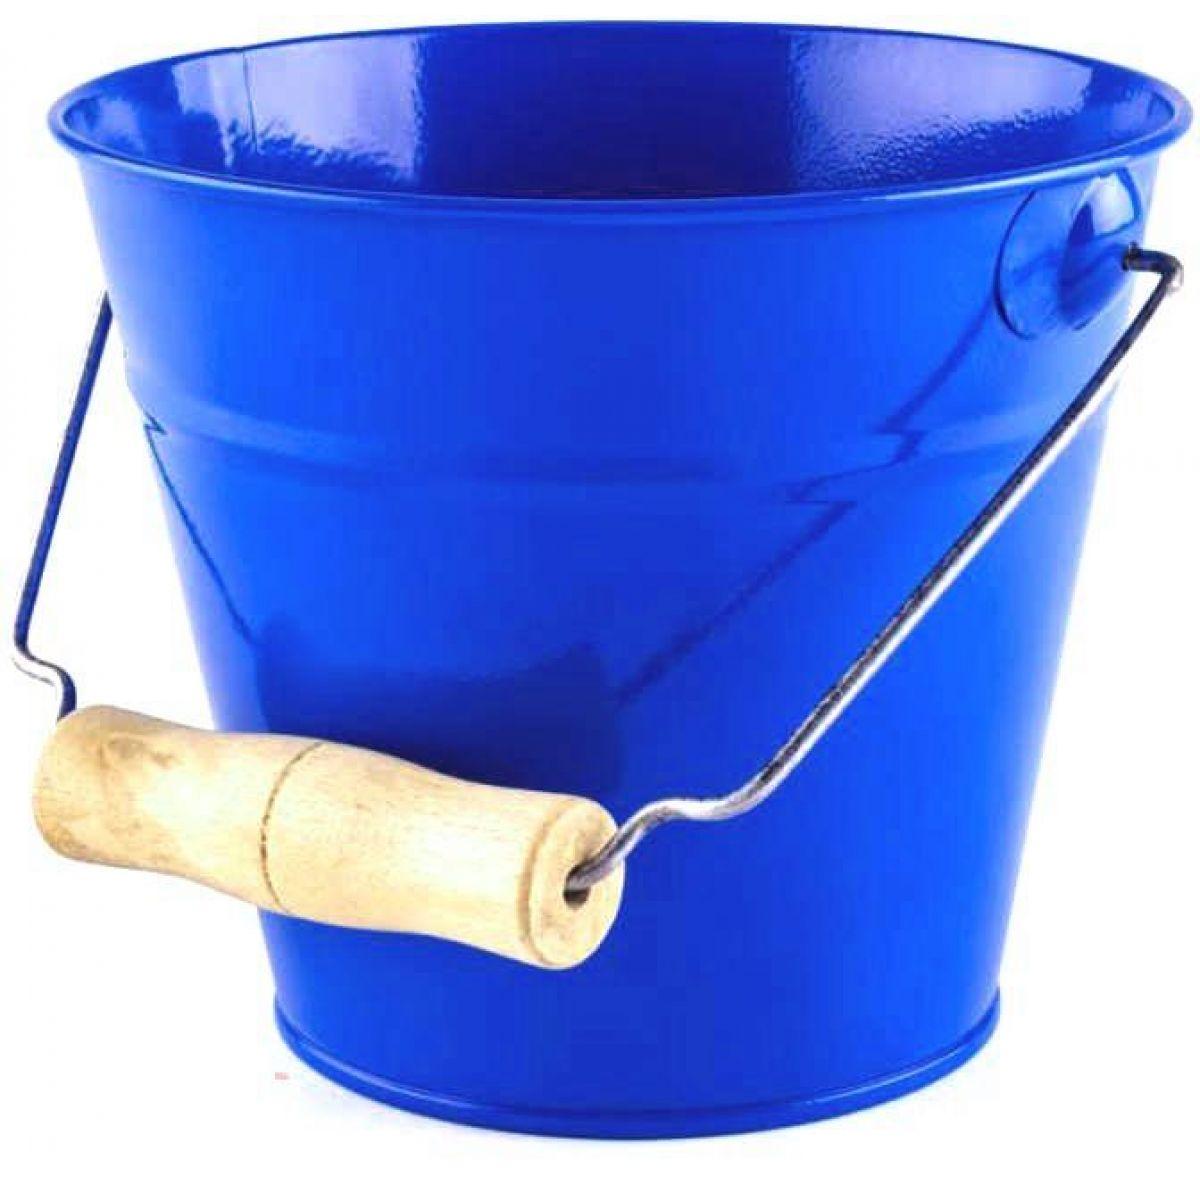 Woody Detský záhradný kýblik modrý